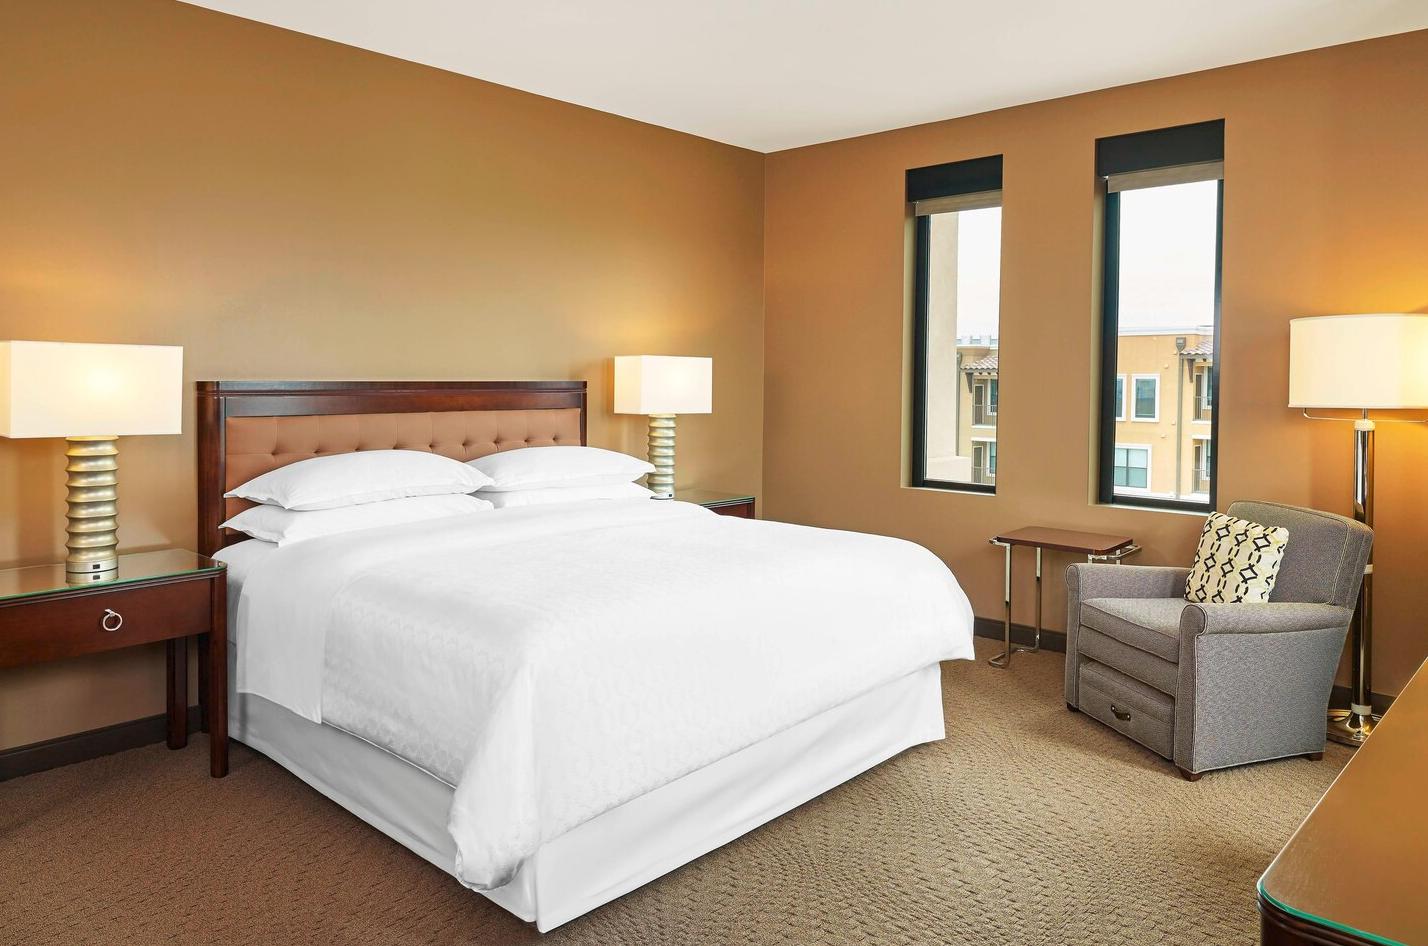 https://www.hotelsbyday.com/_data/default-hotel_image/3/16438/screenshot-2020-04-07-at-4-16-36-pm.png